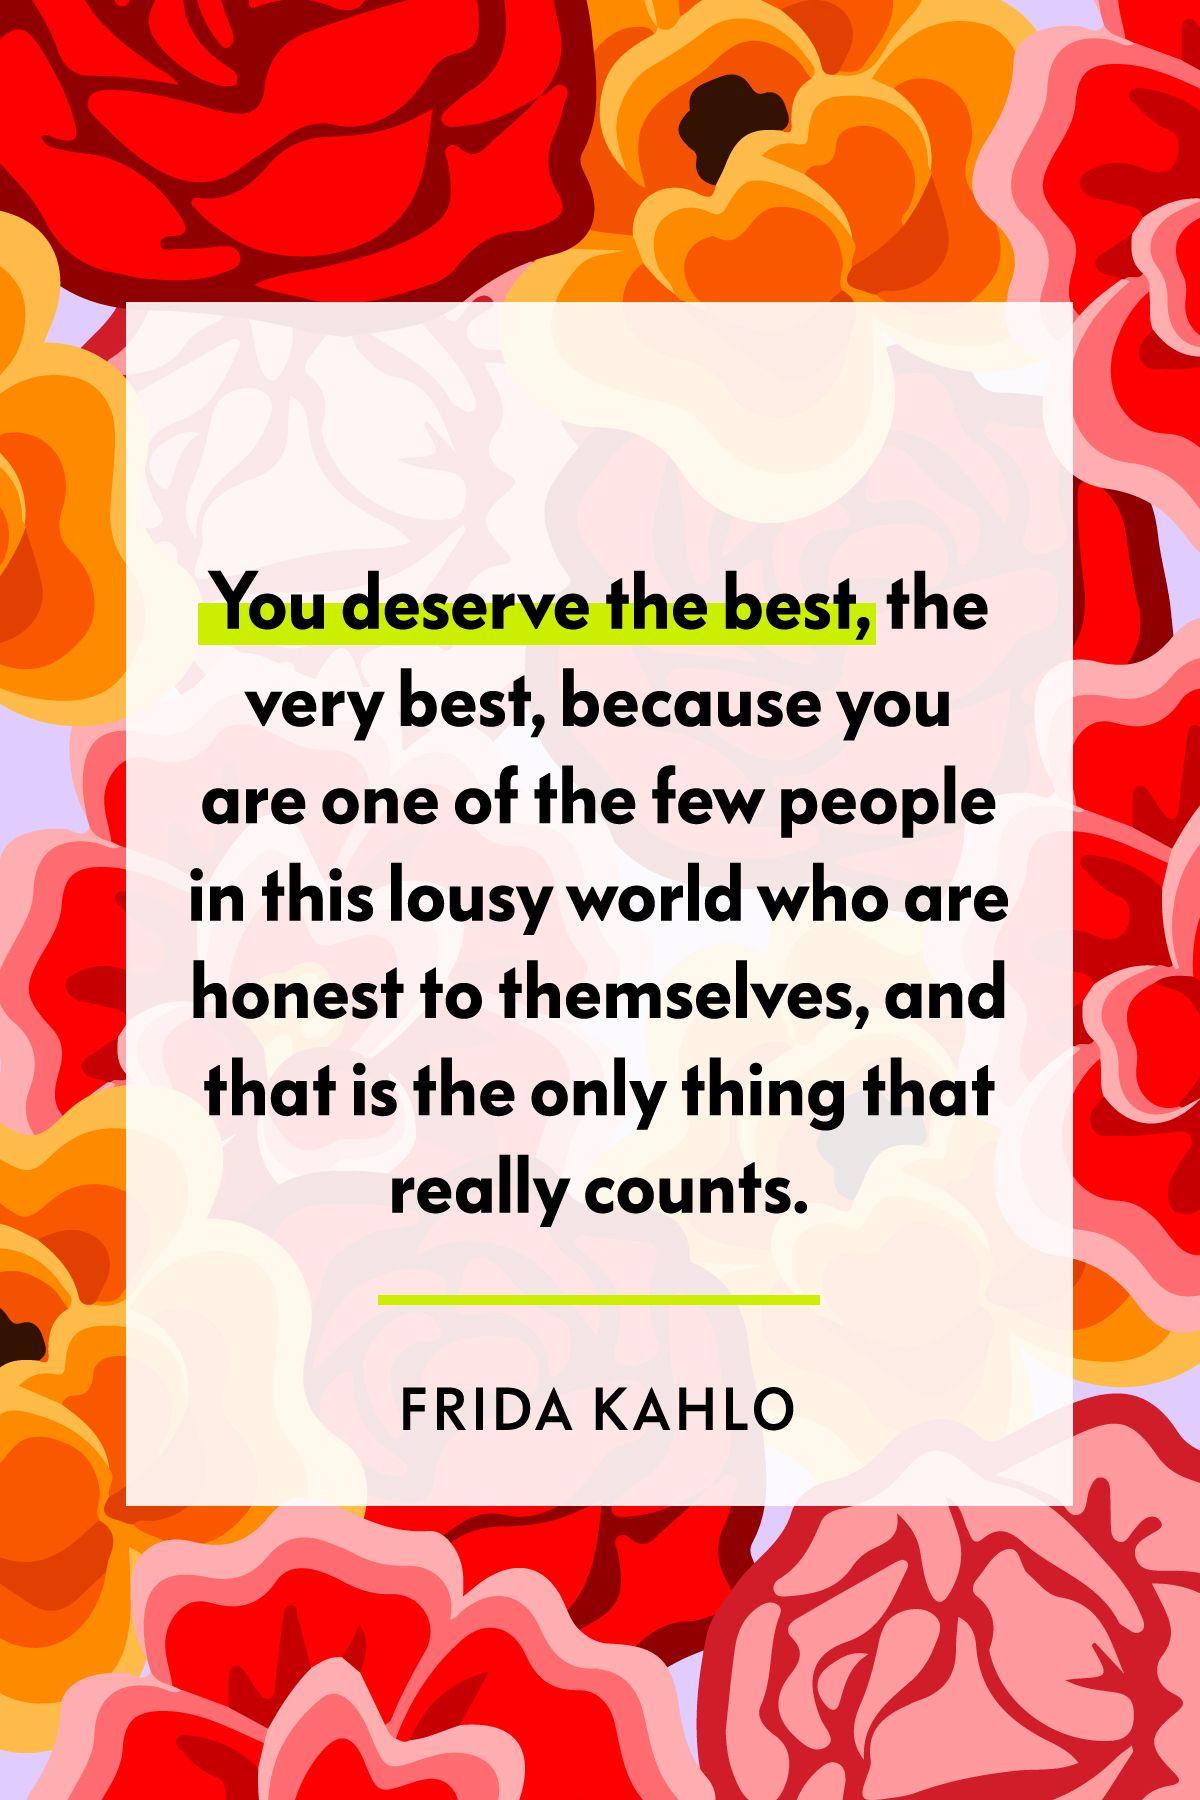 20 Frida Kahlo Quotes — Famous Frida Kahlo Quotes